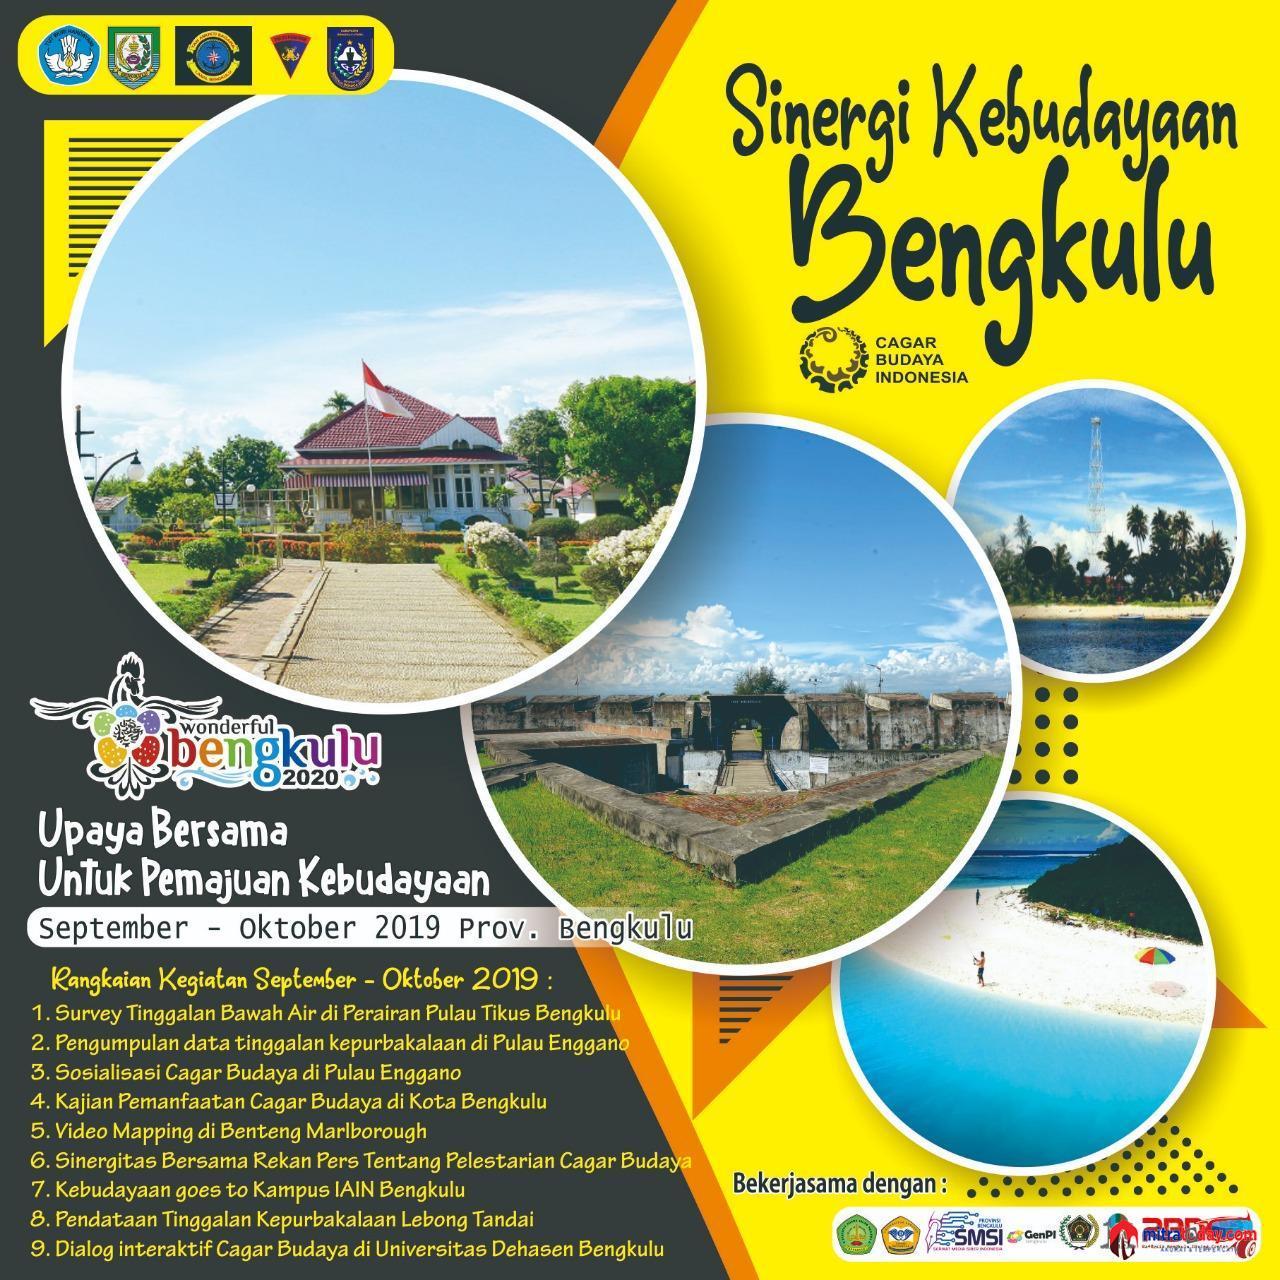 Photo of Perkuat Kerjasama Pelestarian Cagar Budaya, BPCB Gelar Sinergi Kebudayaan Bengkulu